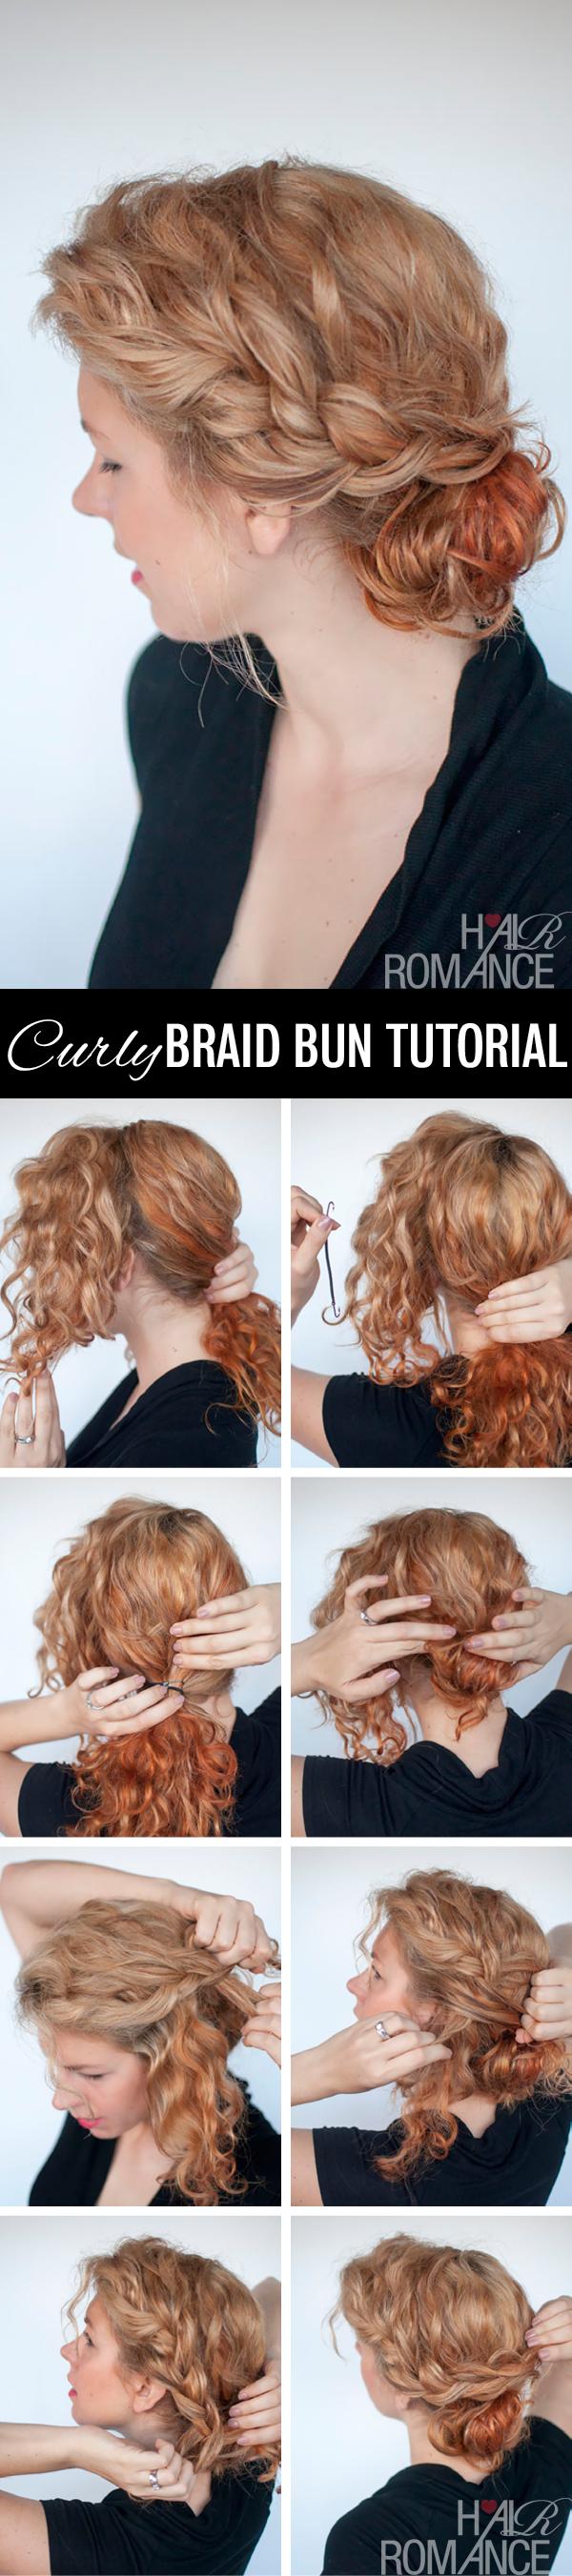 Curly Bun Hairstyle Tutorial Two Ways Hair Romance Curly Bun Hairstyles Hair Romance Curly Hair Romance